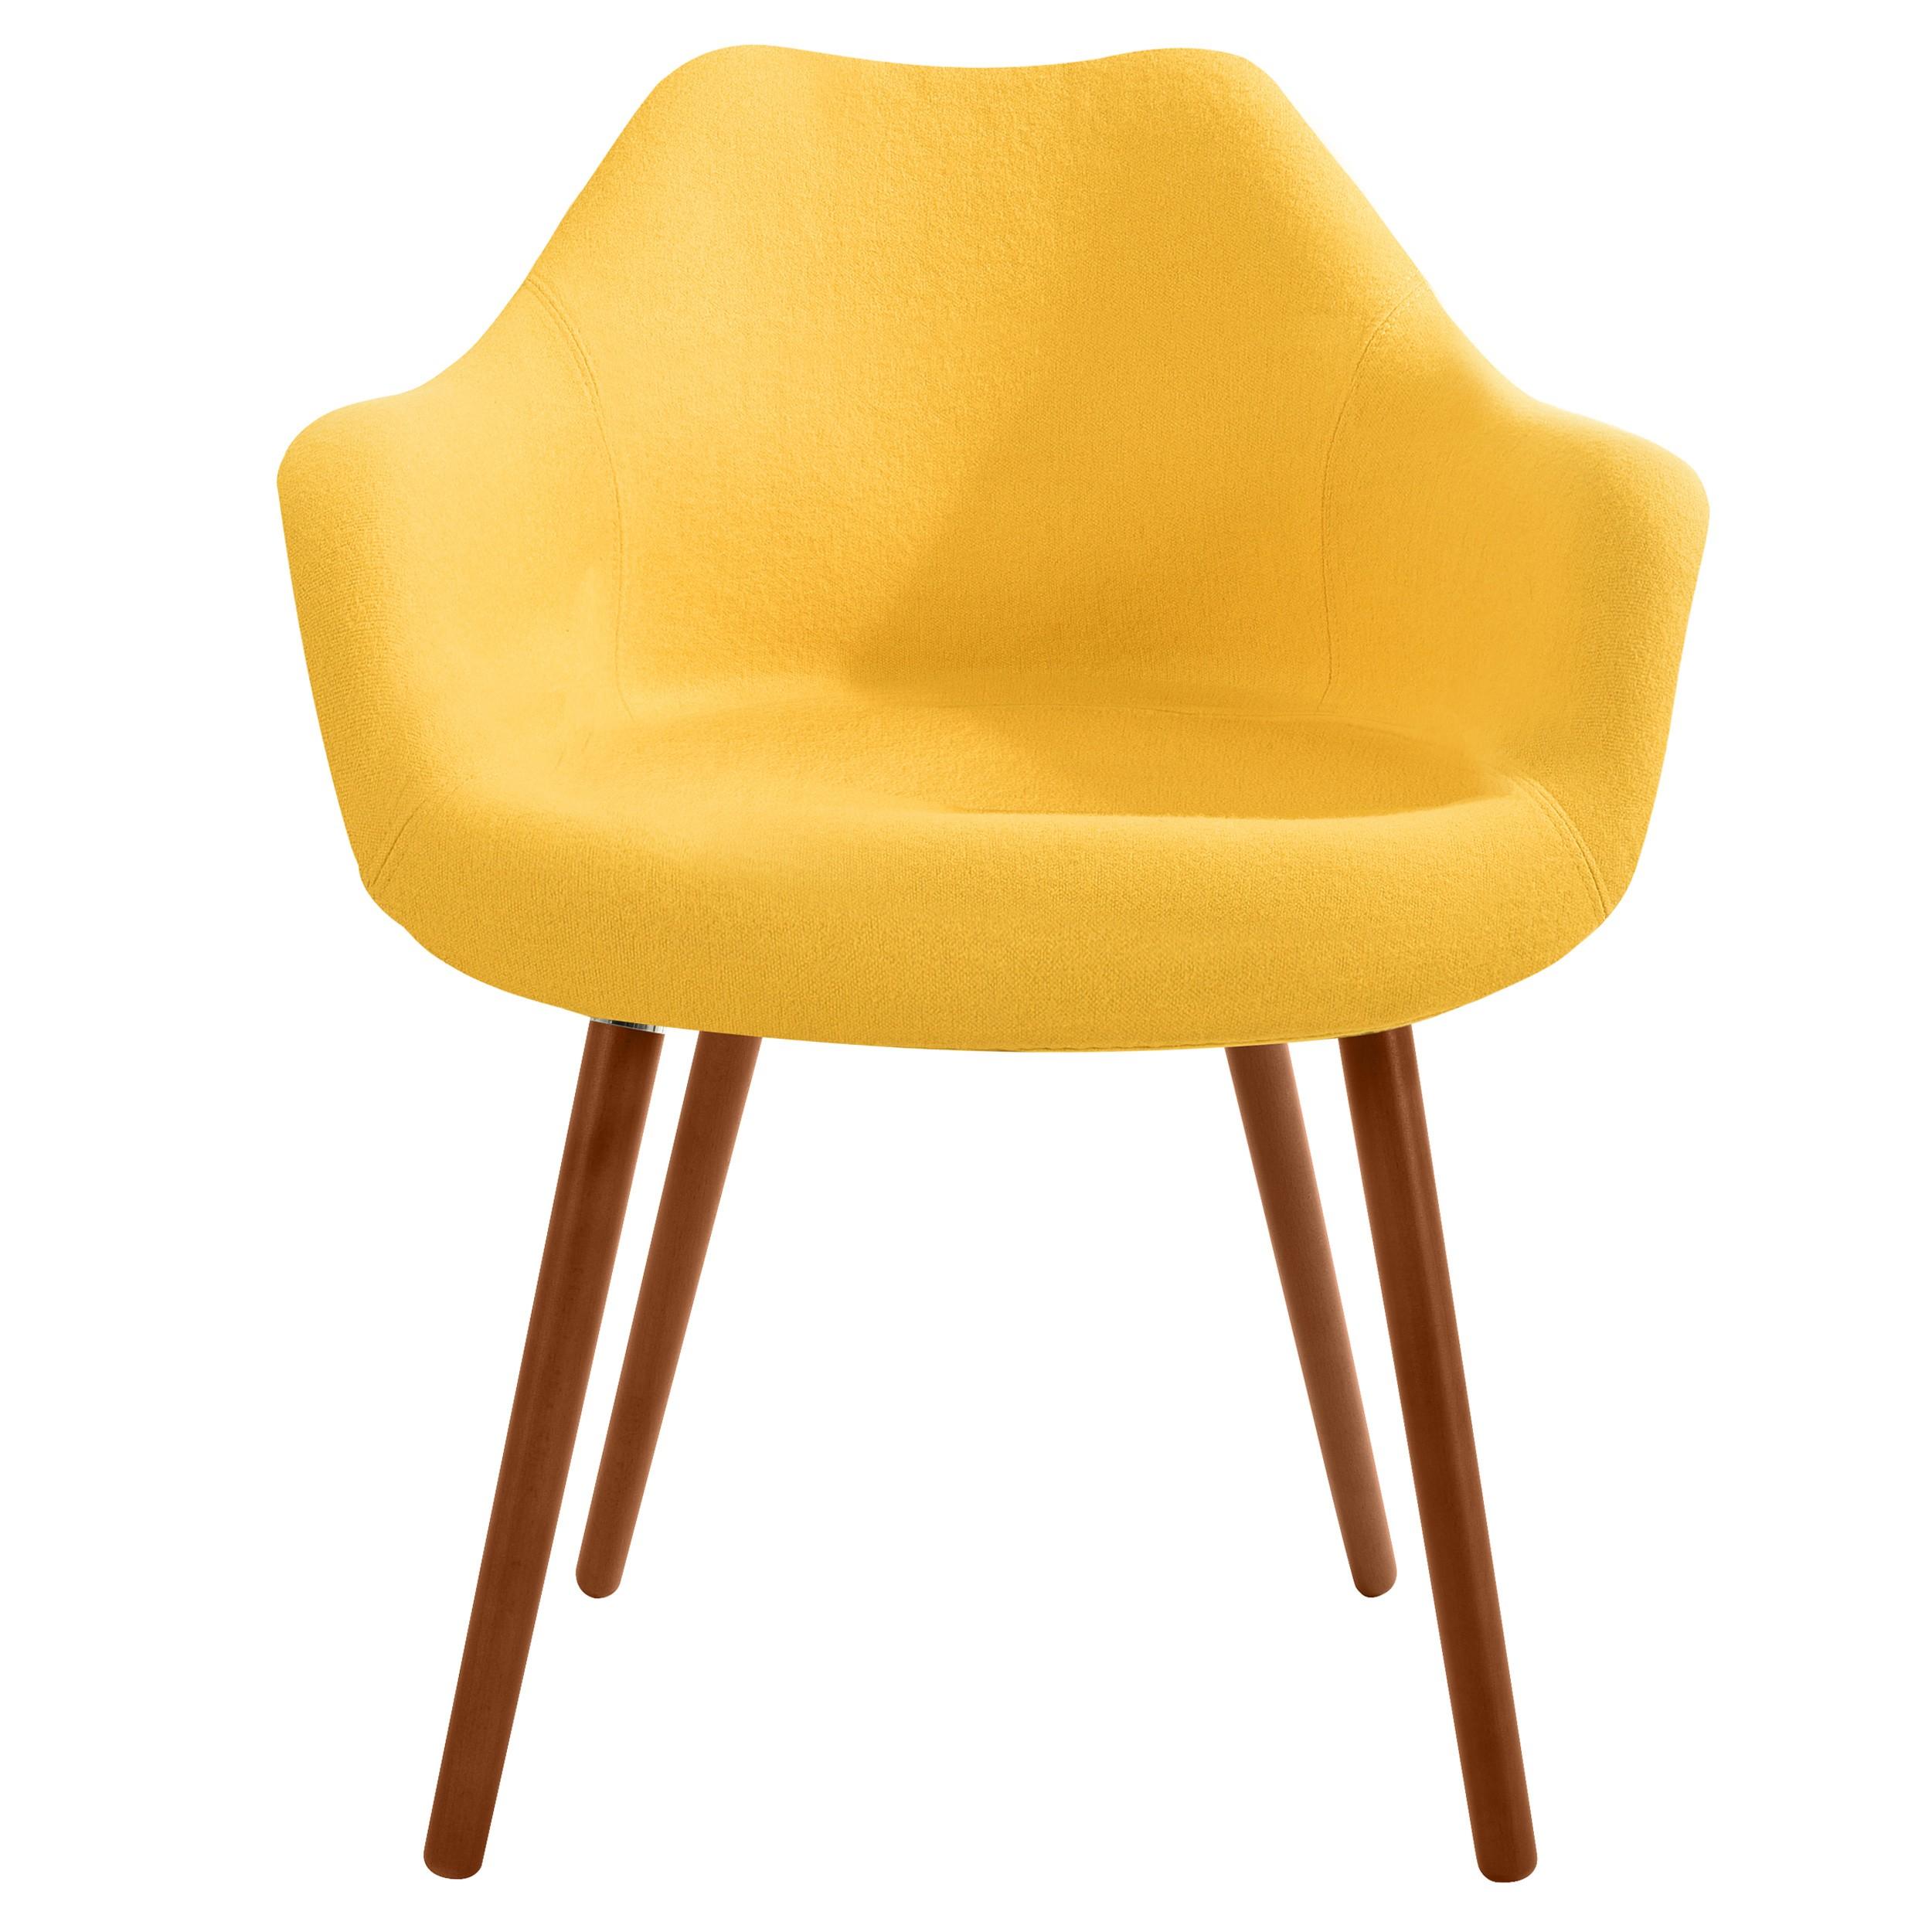 chaise jaune. Black Bedroom Furniture Sets. Home Design Ideas